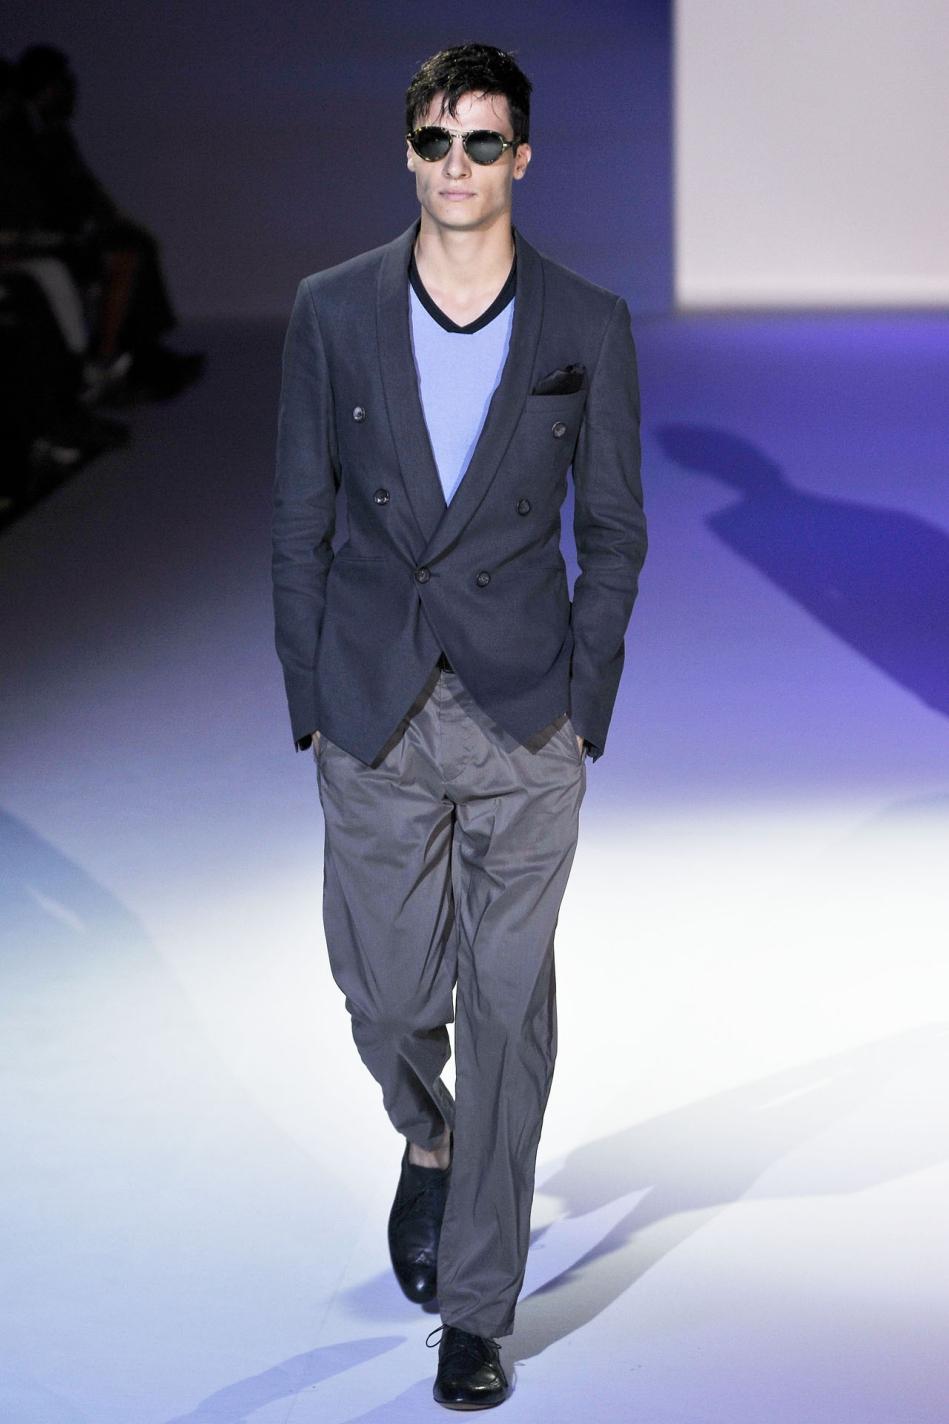 Armani mans Coats   Giorgio Armani suits for men 2011-2012 ...